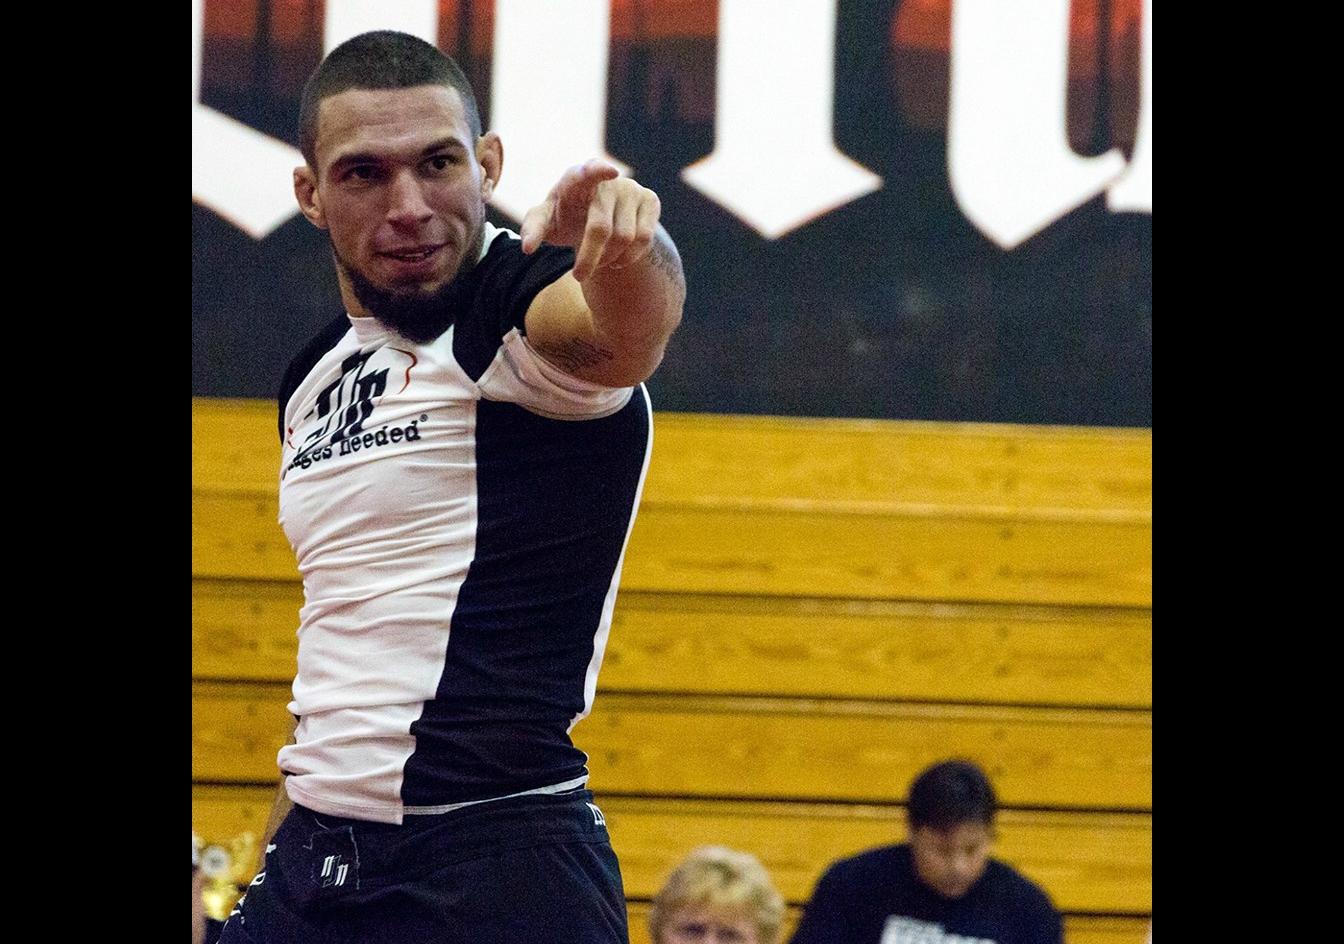 Ruben Alvarez Tells His Side of the Story on Exposing the Fake Black Belt